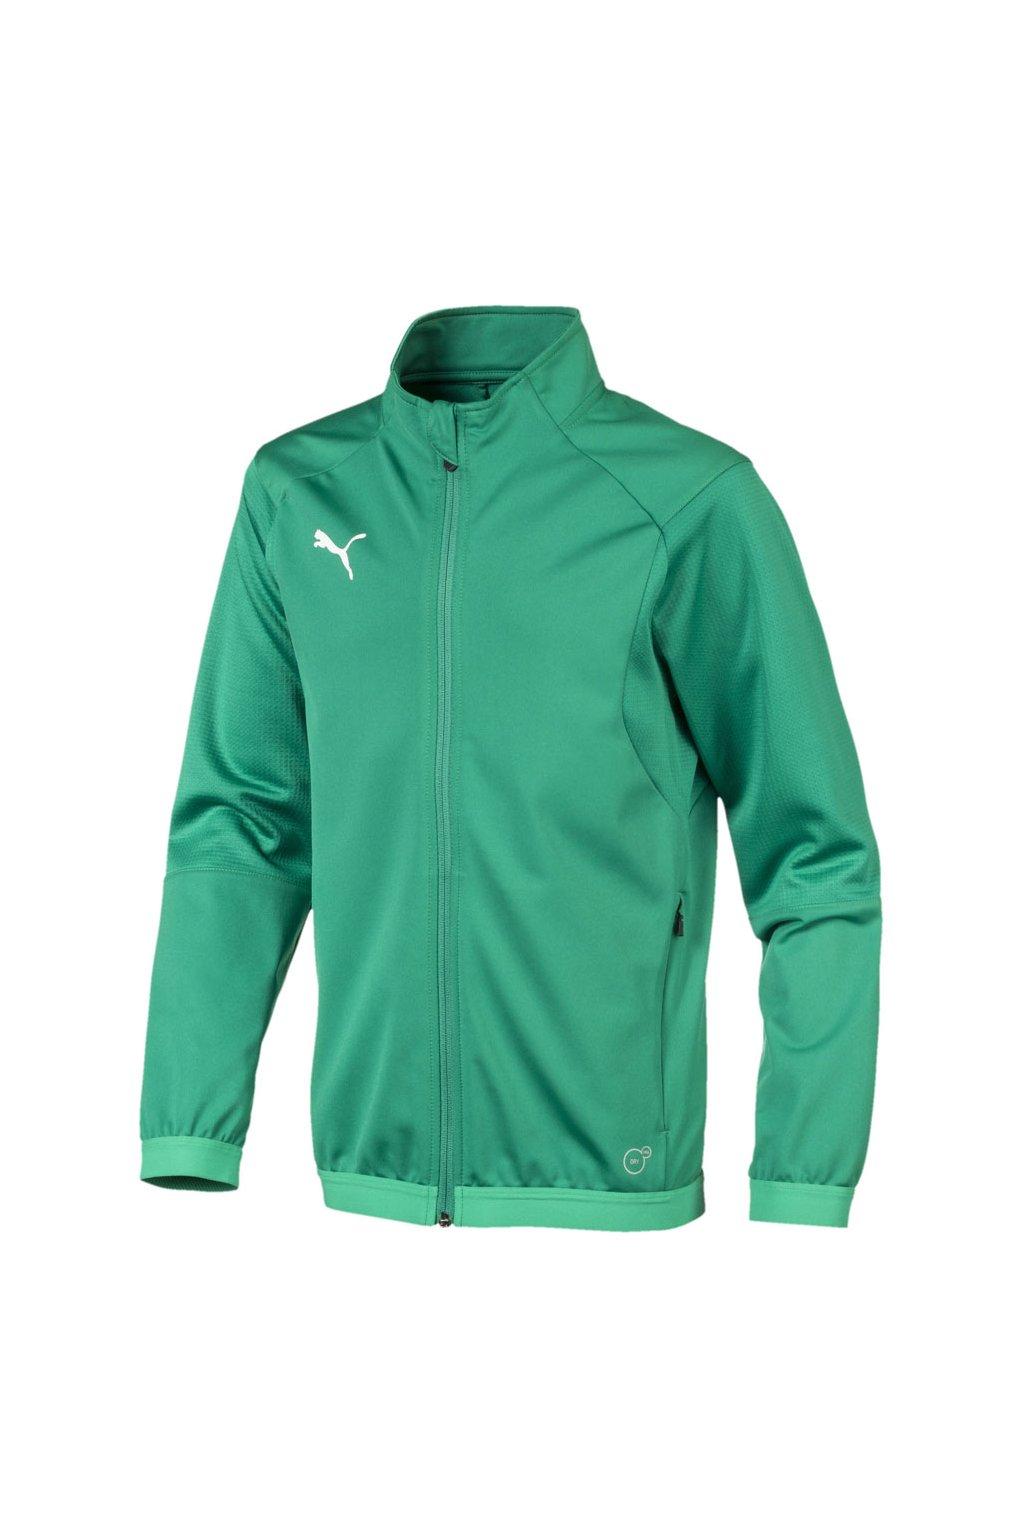 Detská mikina Puma Liga Training Jacket JUNIOR zelená 655688 05